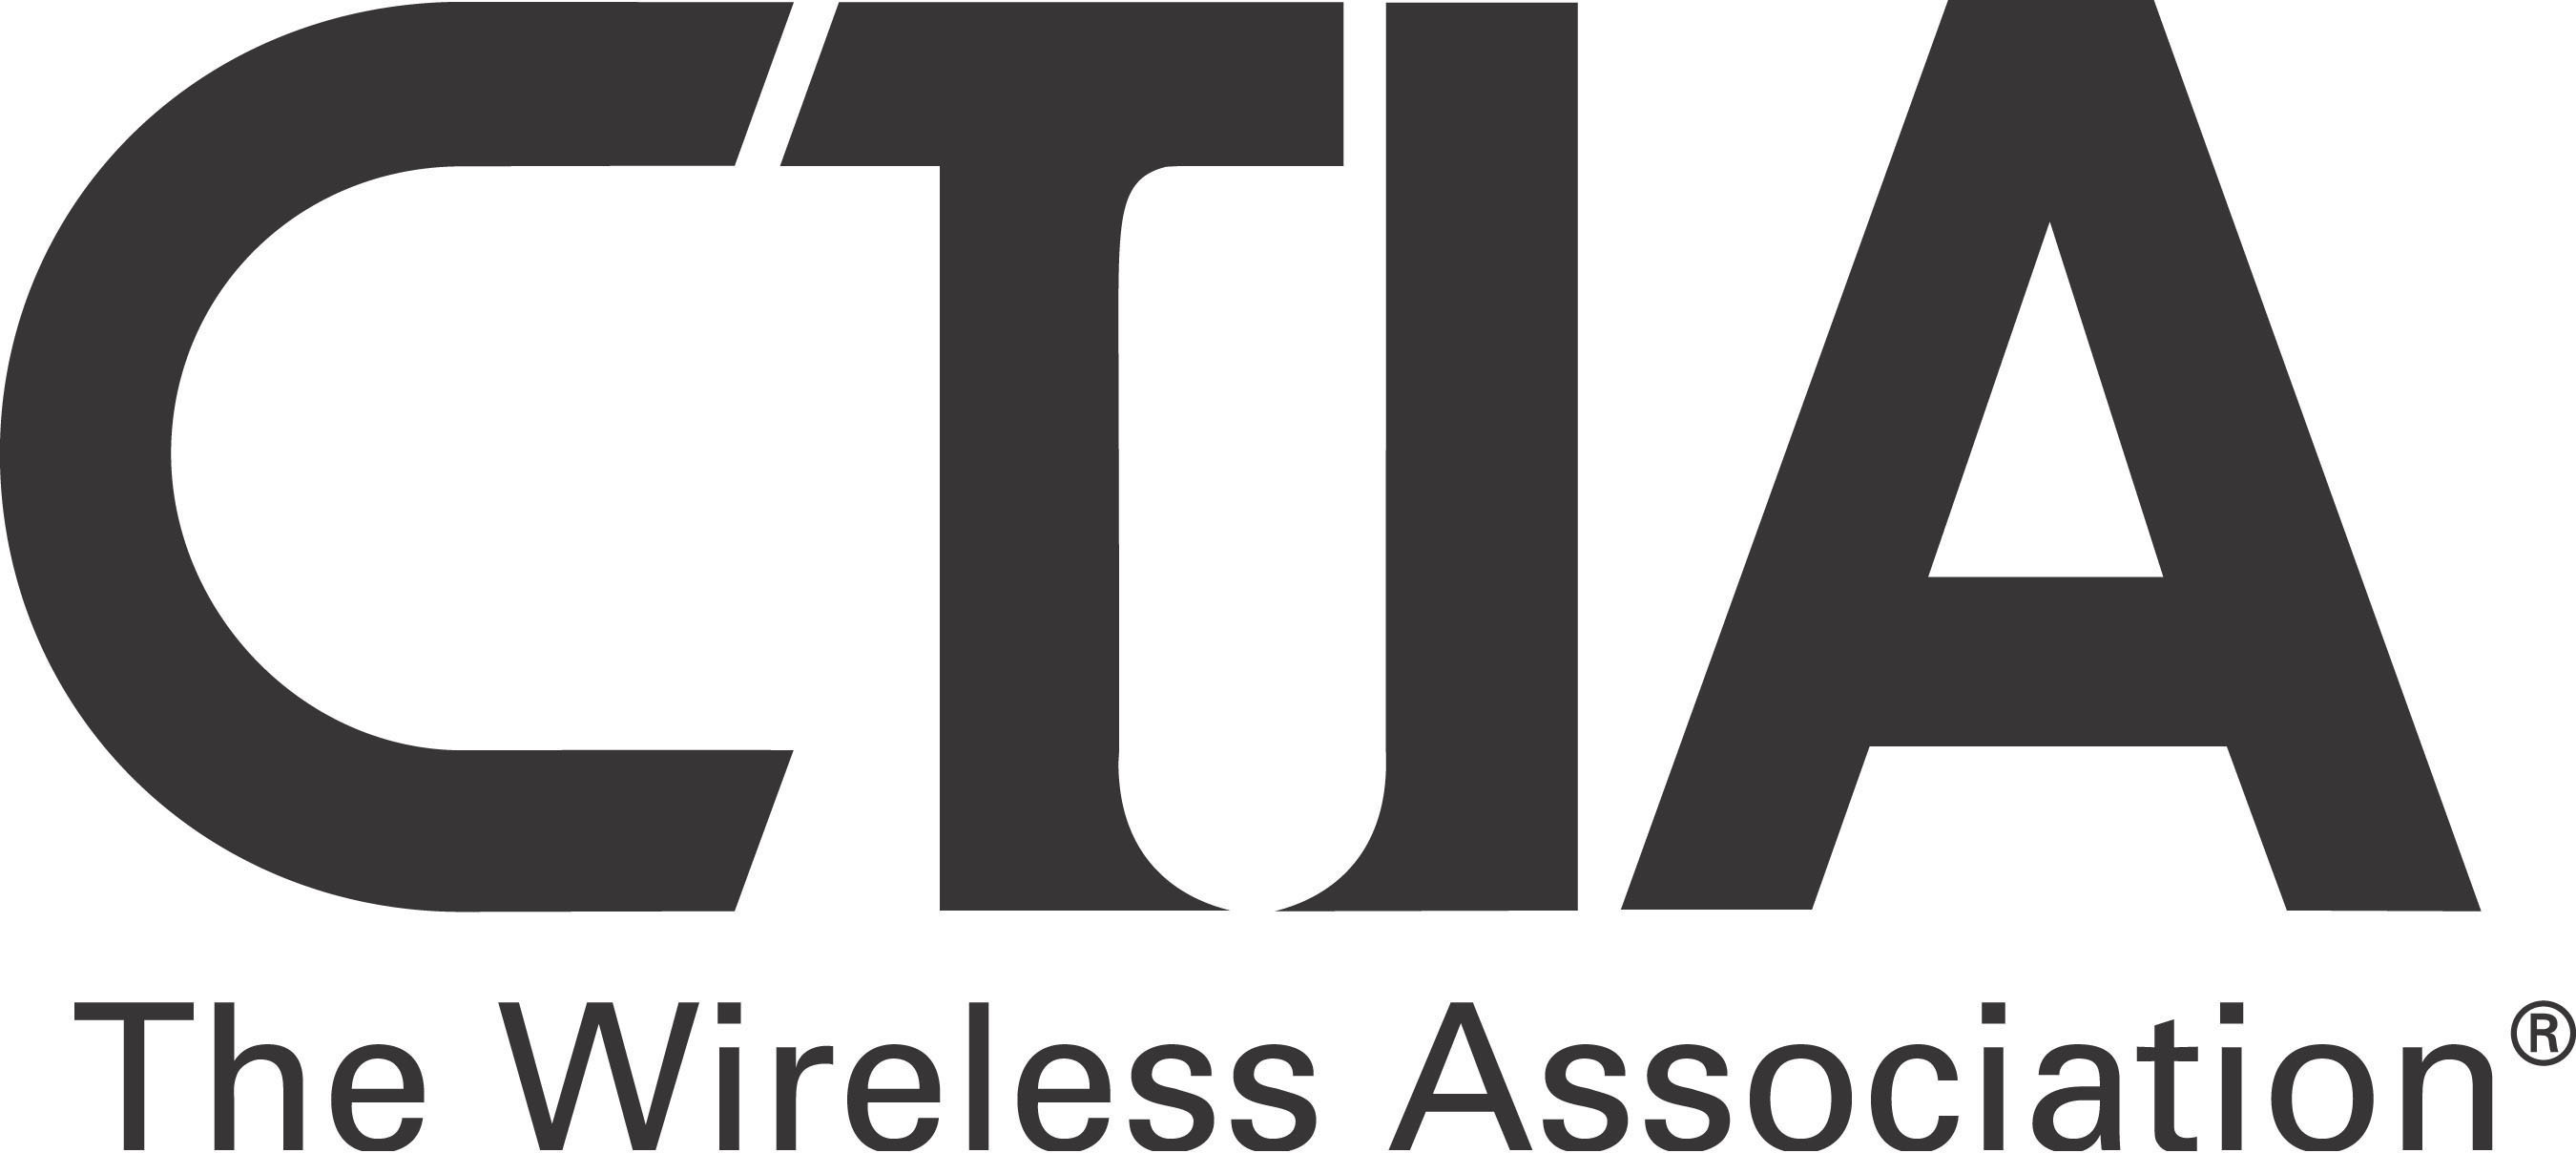 CTIA: The Wireless Association Logo